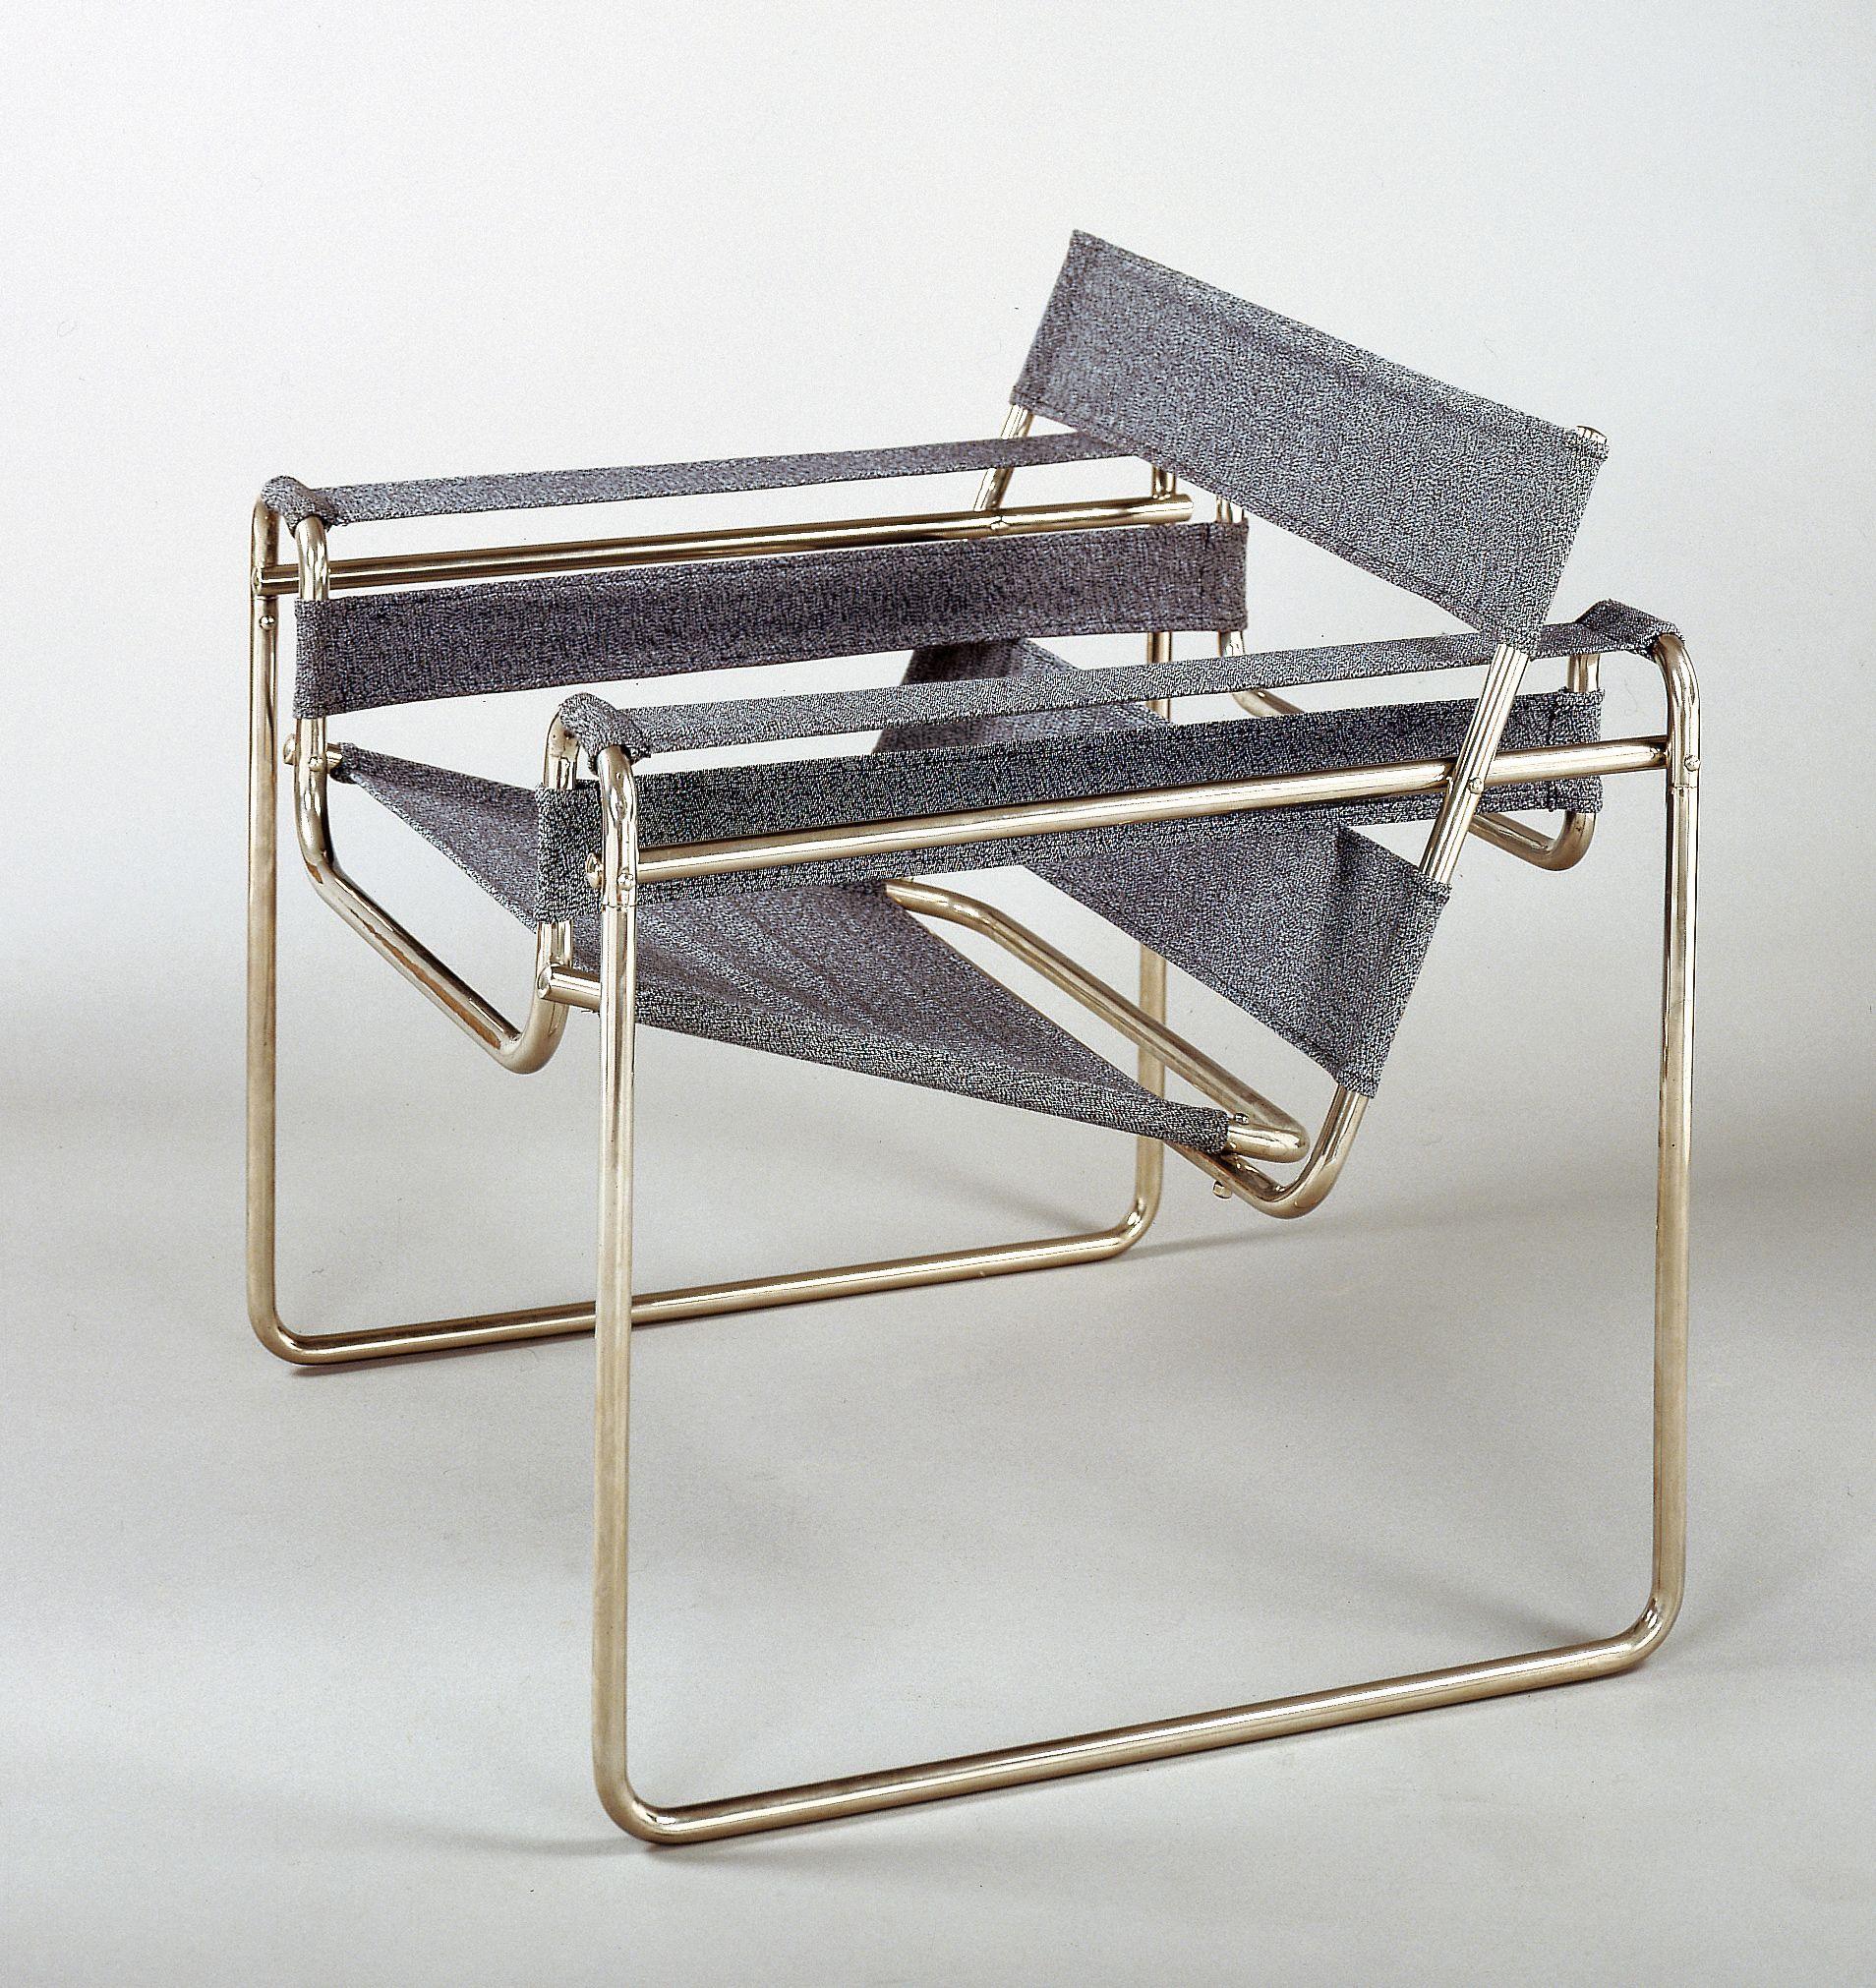 Bauhaus Furniture Mobi Current Exhibition Bauhaus Furniture  # Muebles Bauhaus Caracteristicas